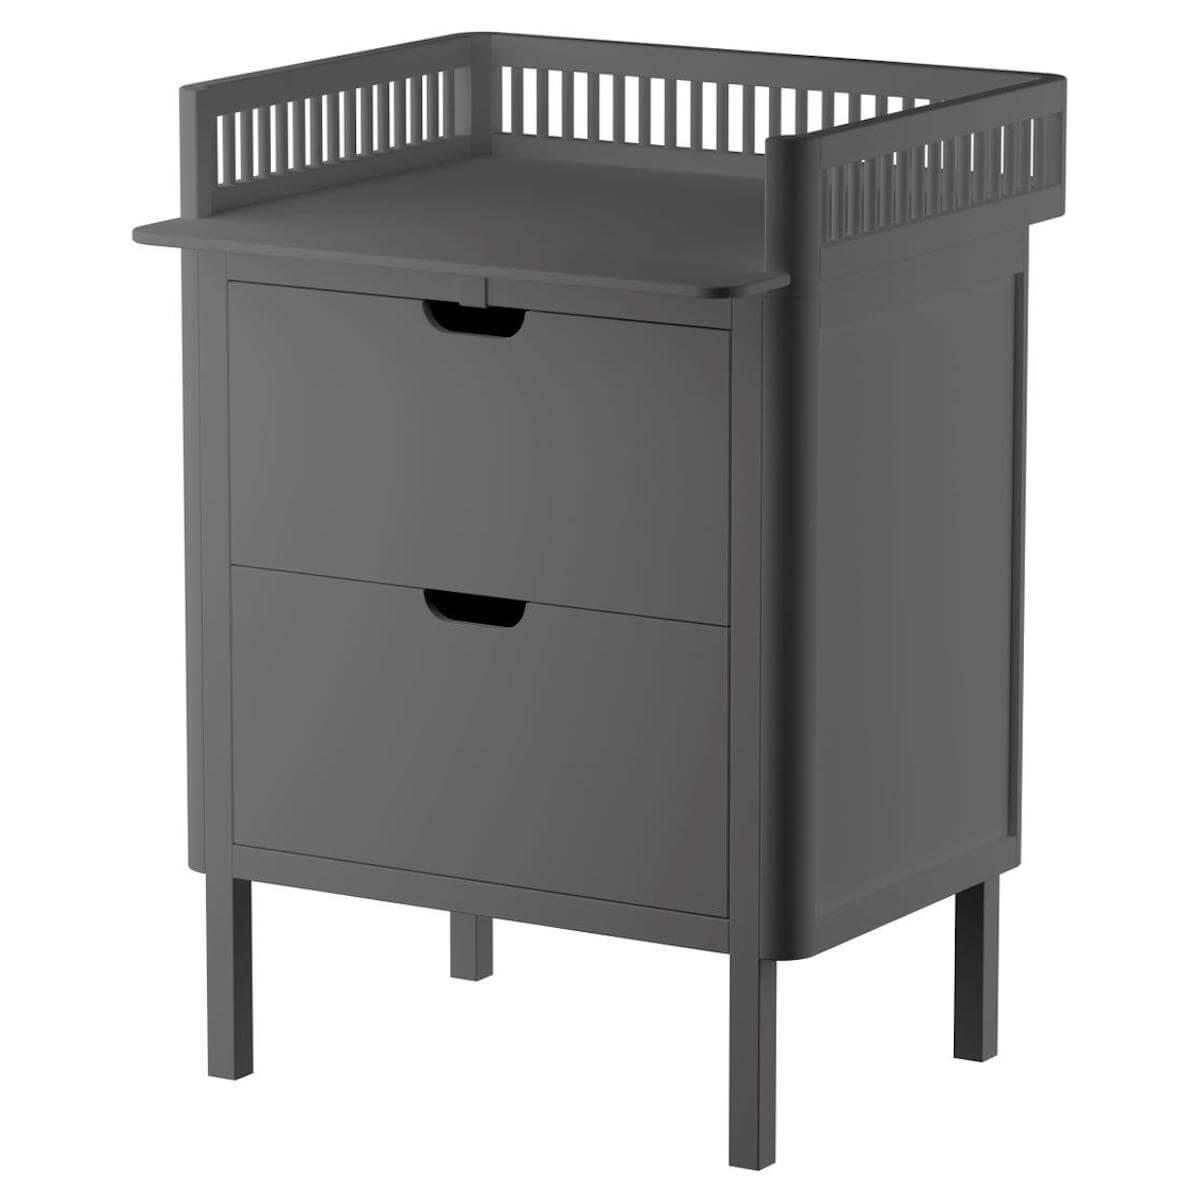 Table à langer 2 tiroirs Sebra classic grey